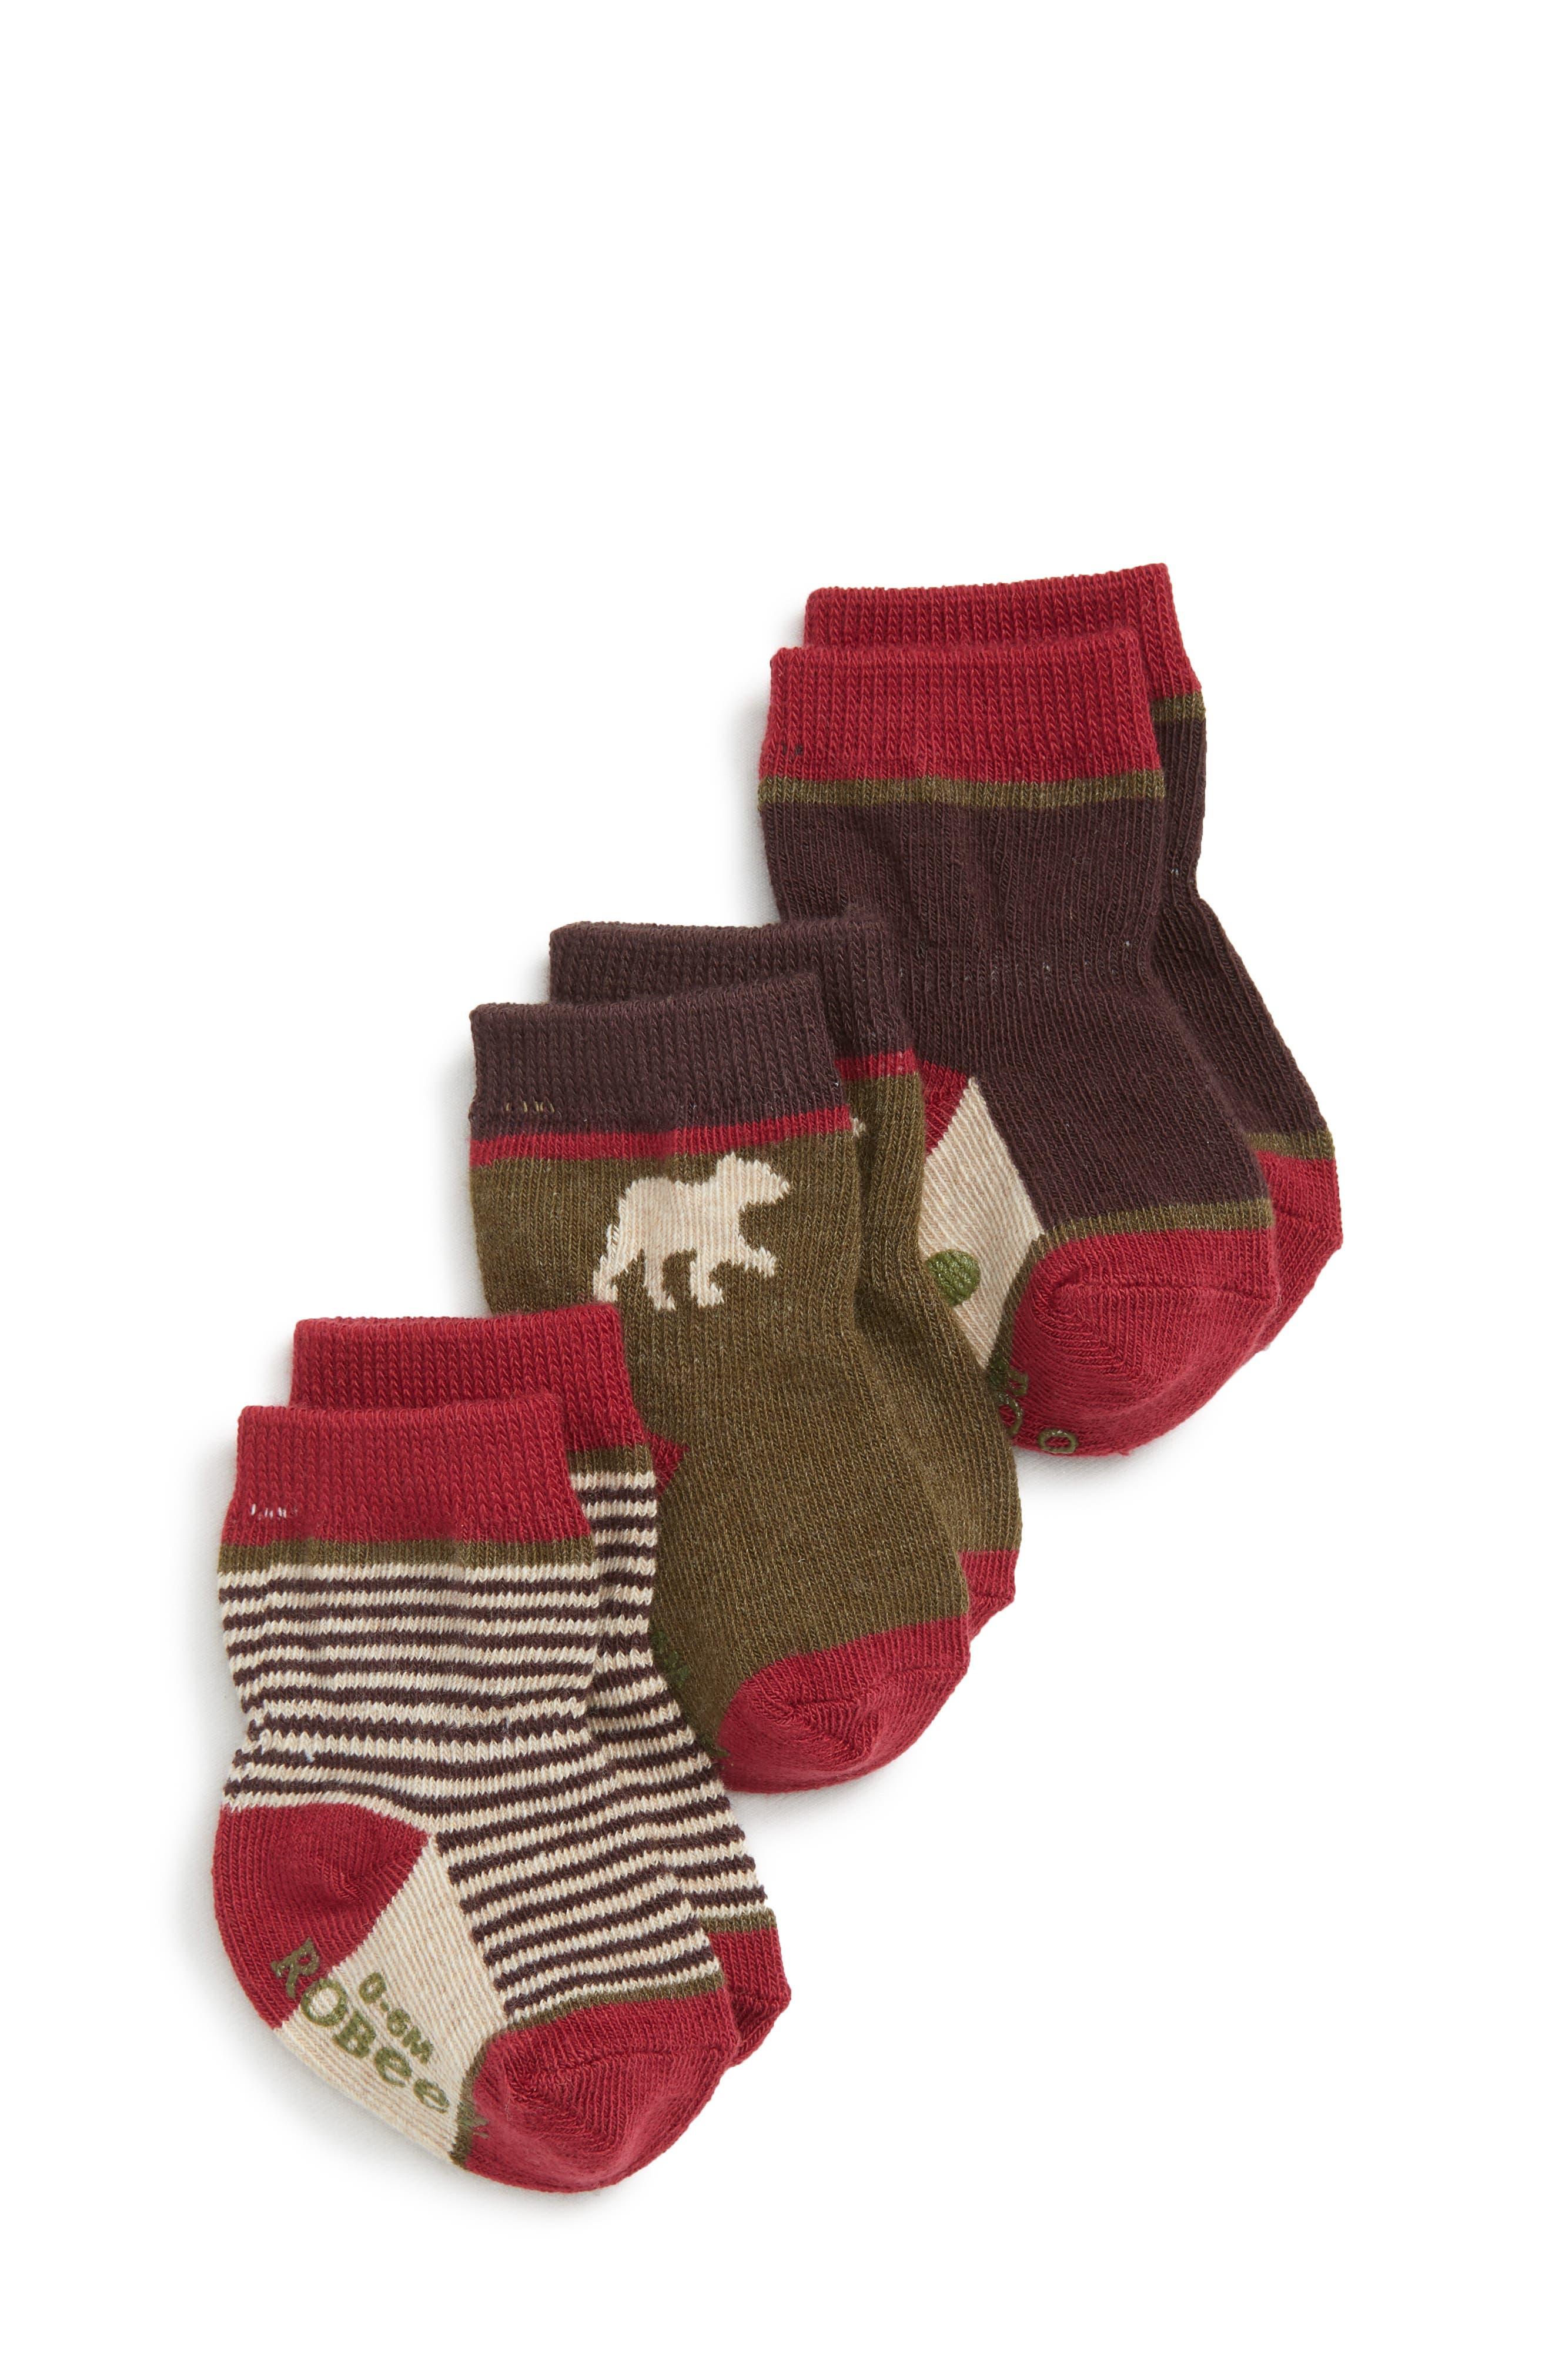 Forest Dweller 3-Pack Socks,                         Main,                         color, RED/ BROWN